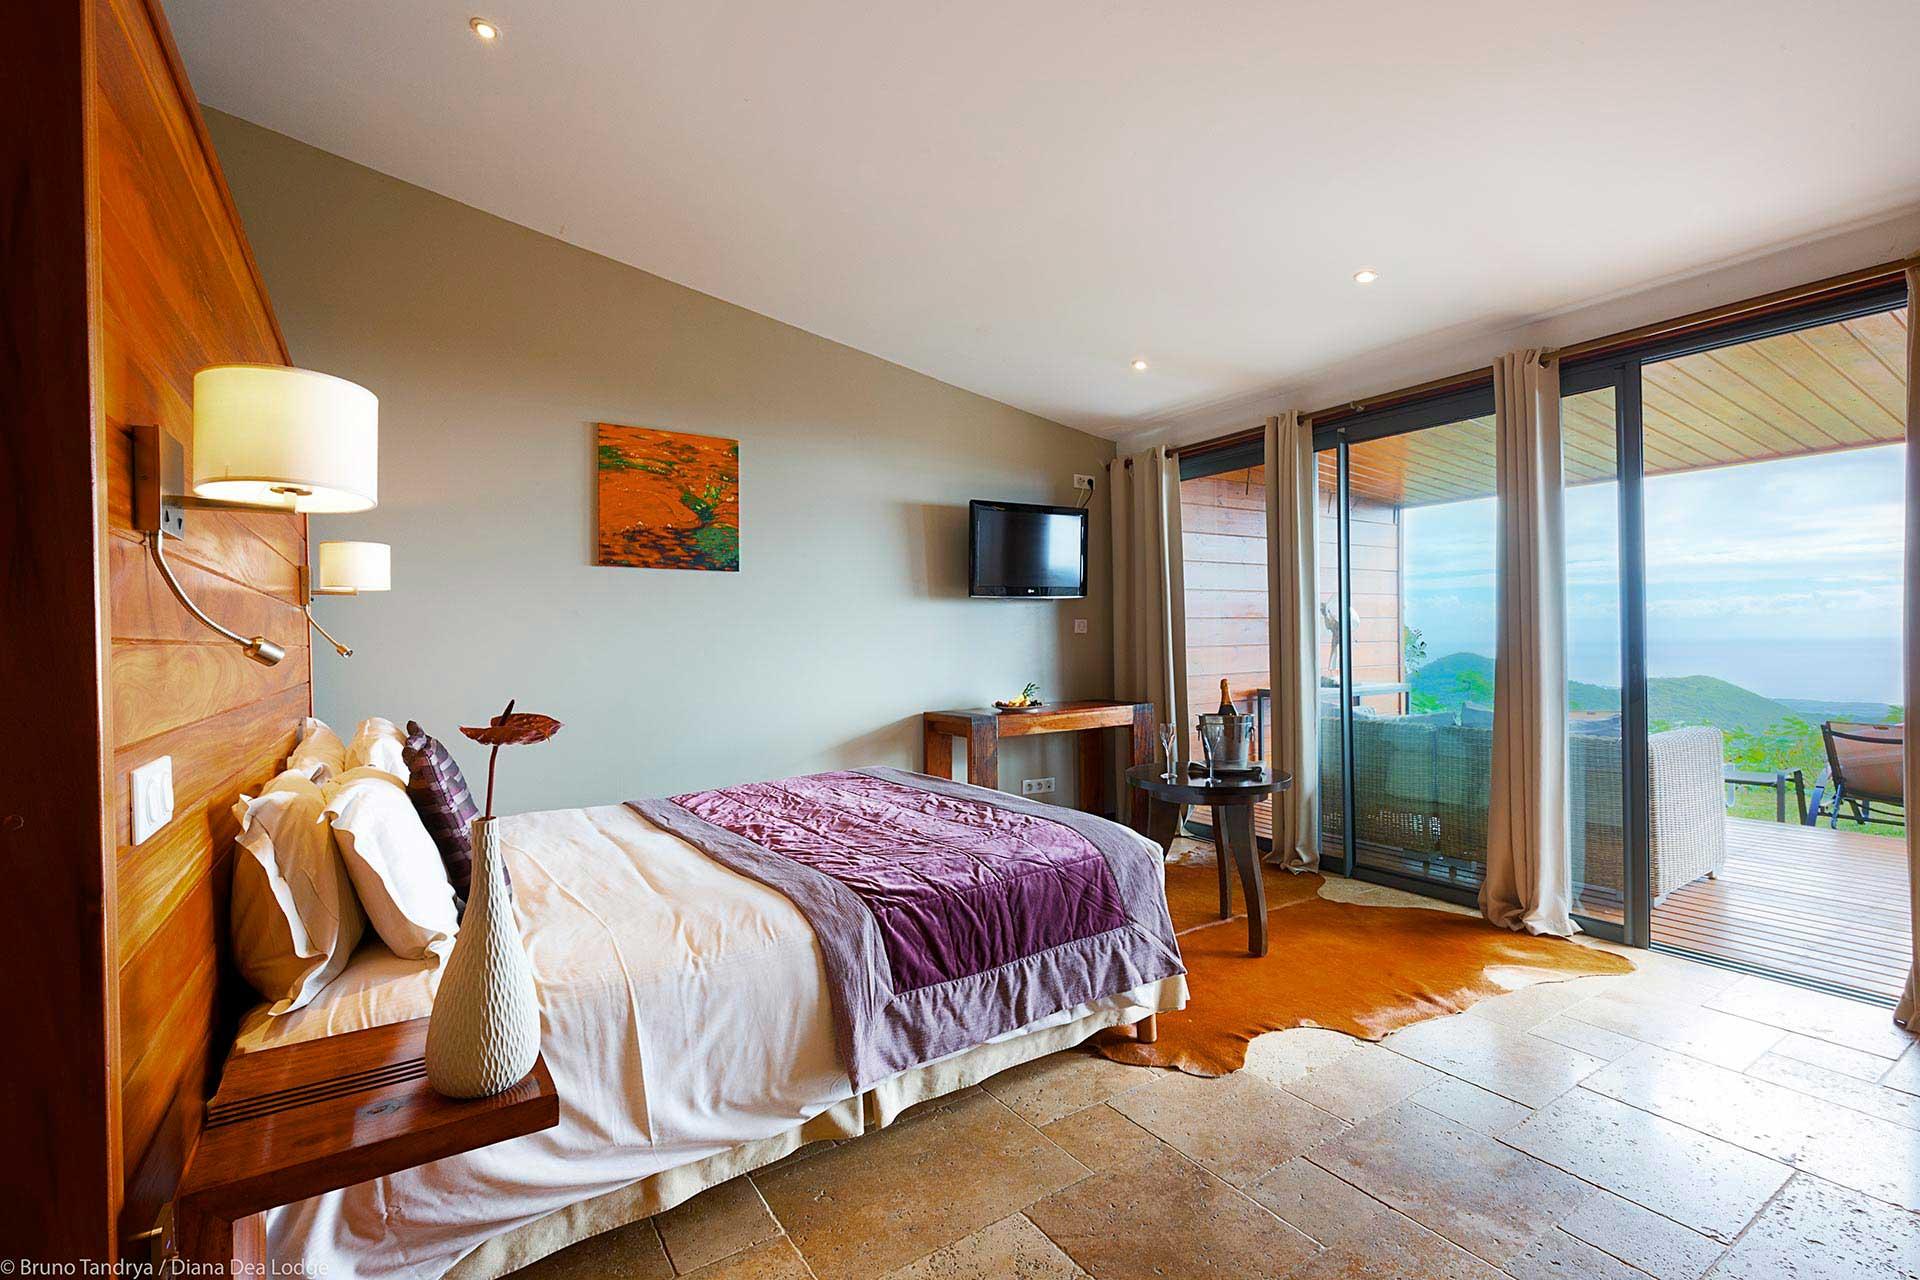 Chambre-Privilège-BRUNO-TANDRYA - Hôtel Diana Dea Lodge